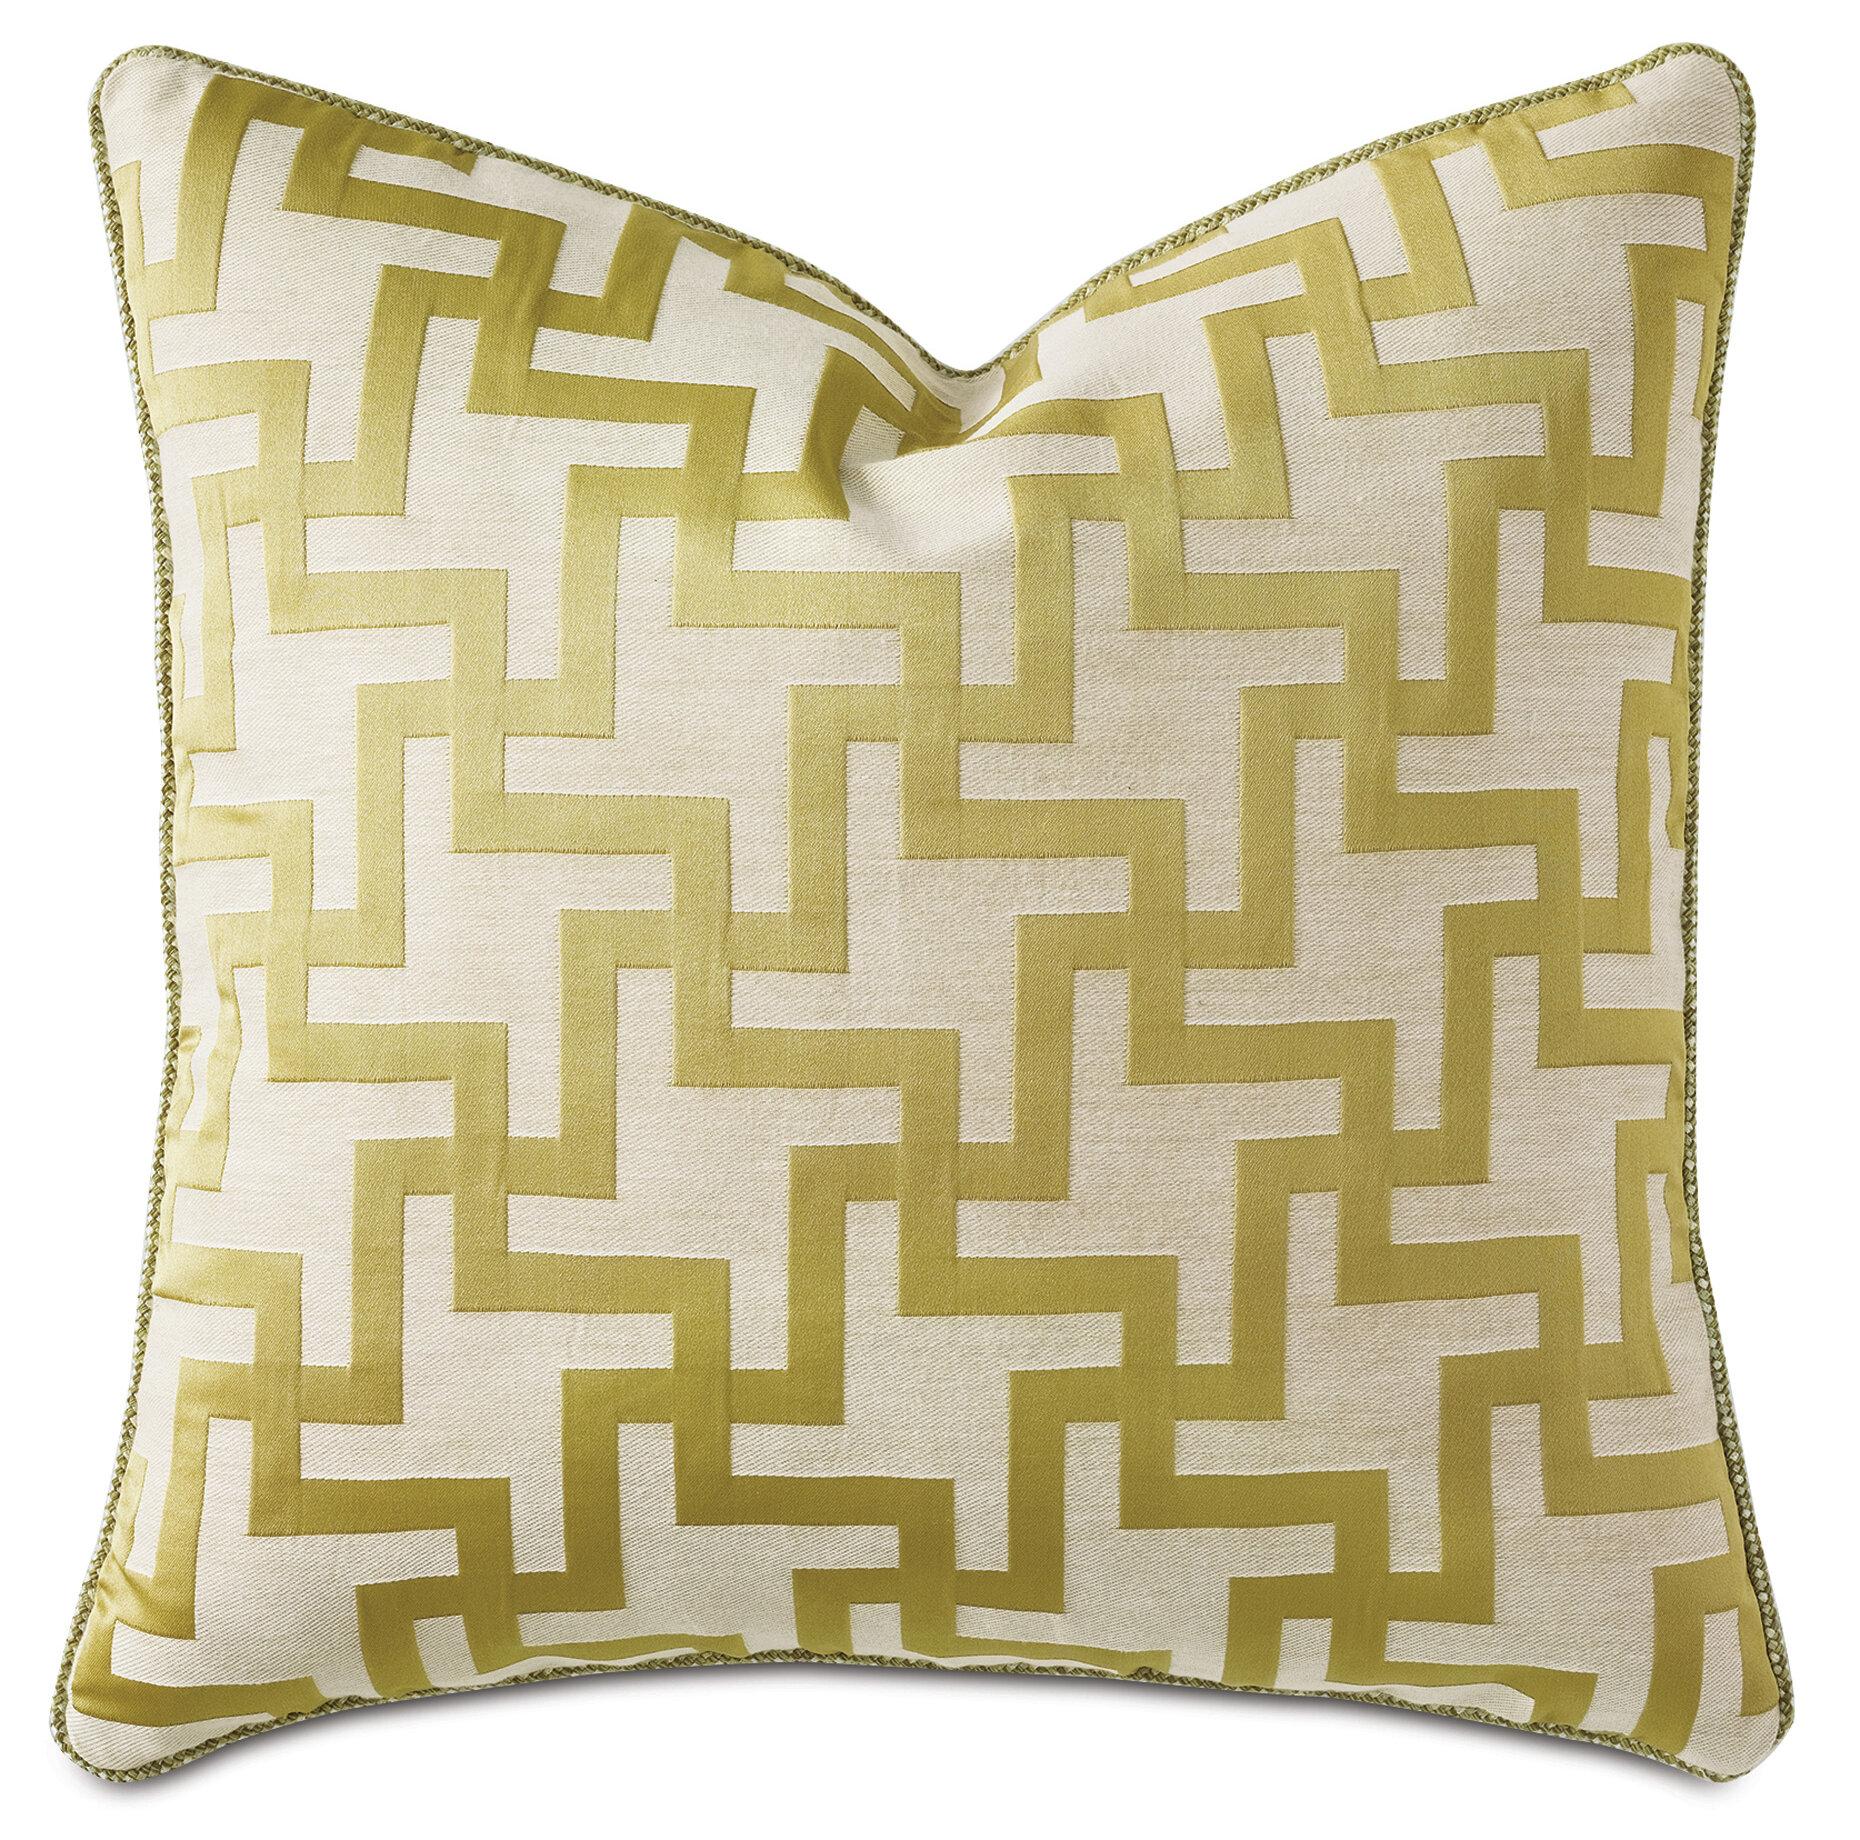 Eastern Accents Alexa Hampton Maude Citrine Decorative Throw Pillow Wayfair